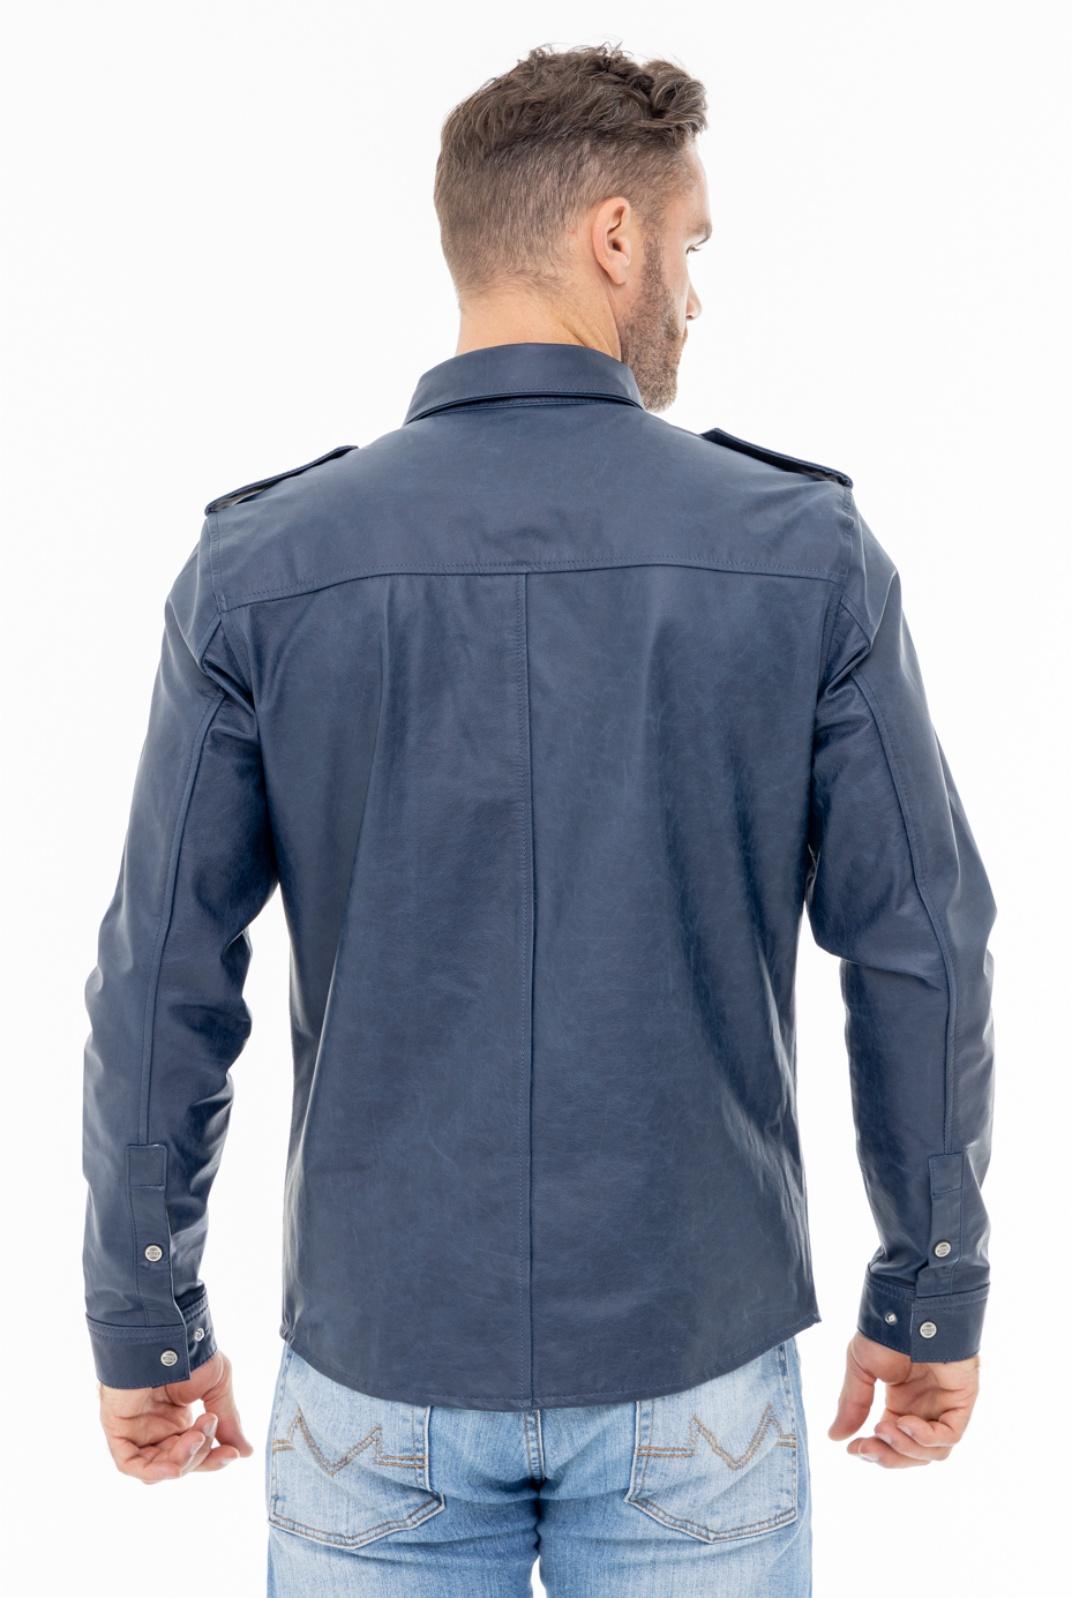 Camisa de Couro Jack 310